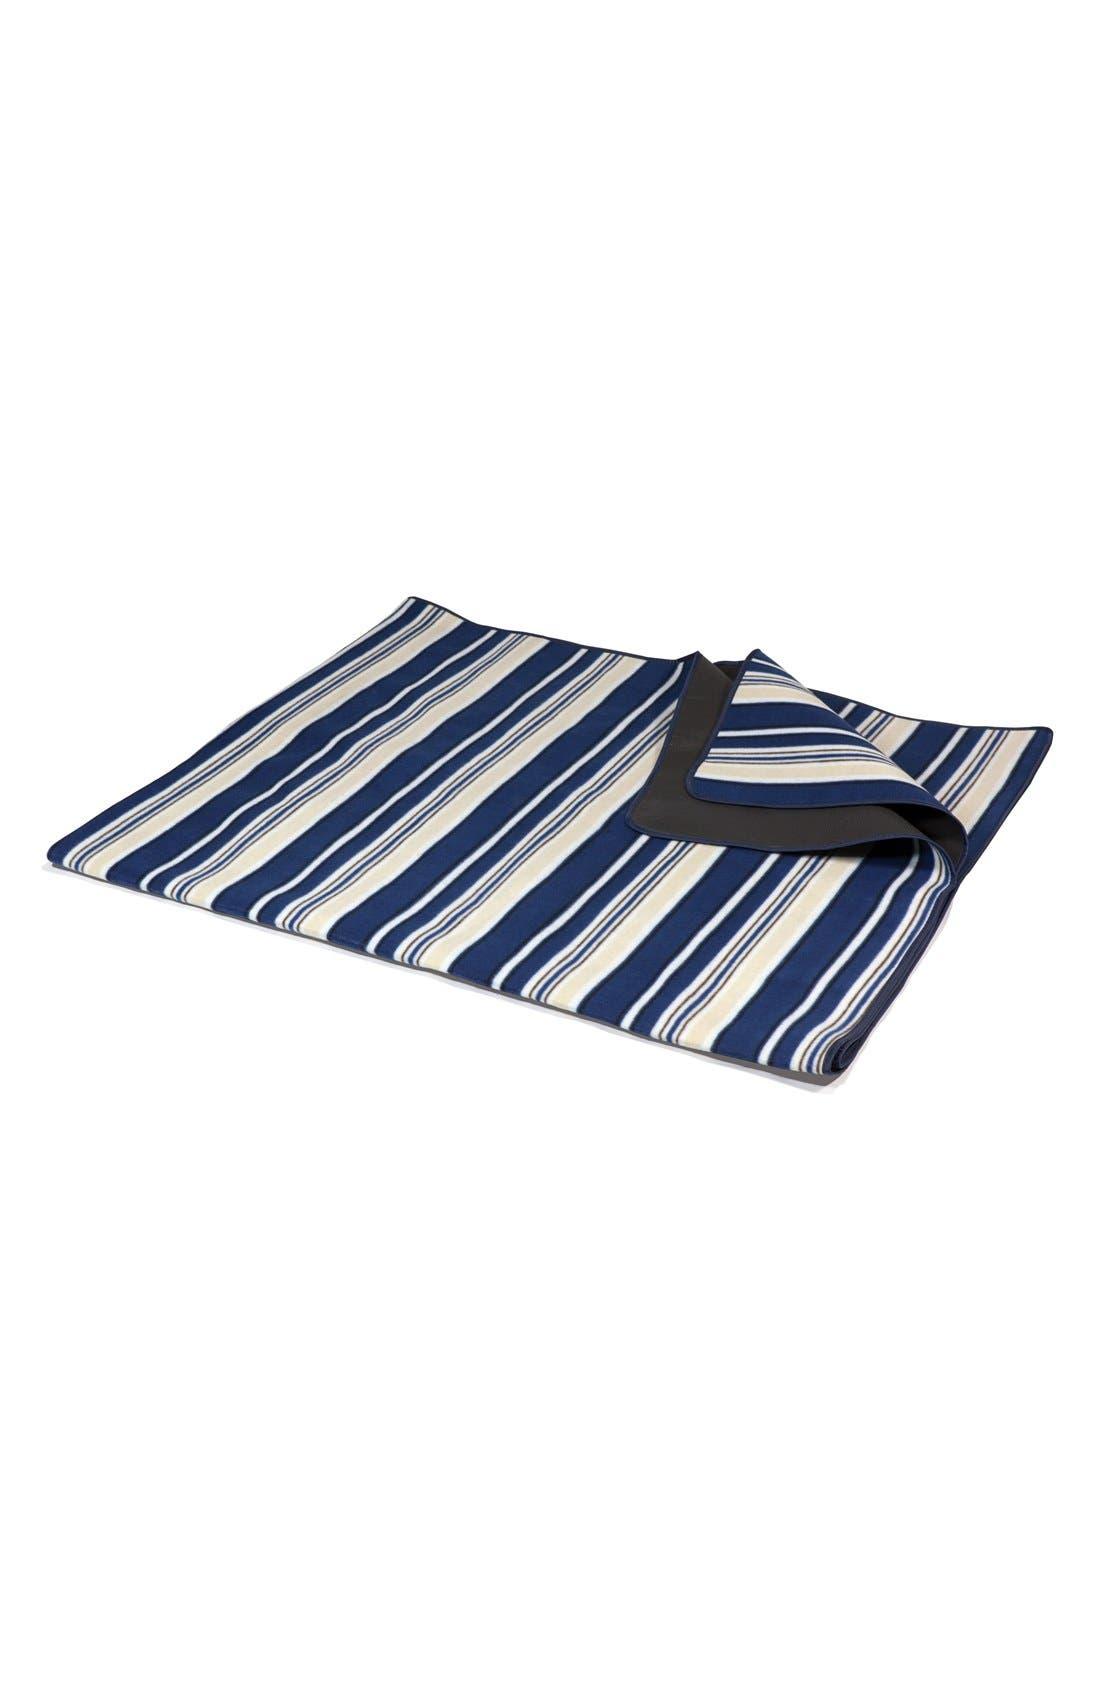 Main Image - Picnic Time 'XL' Blanket Tote